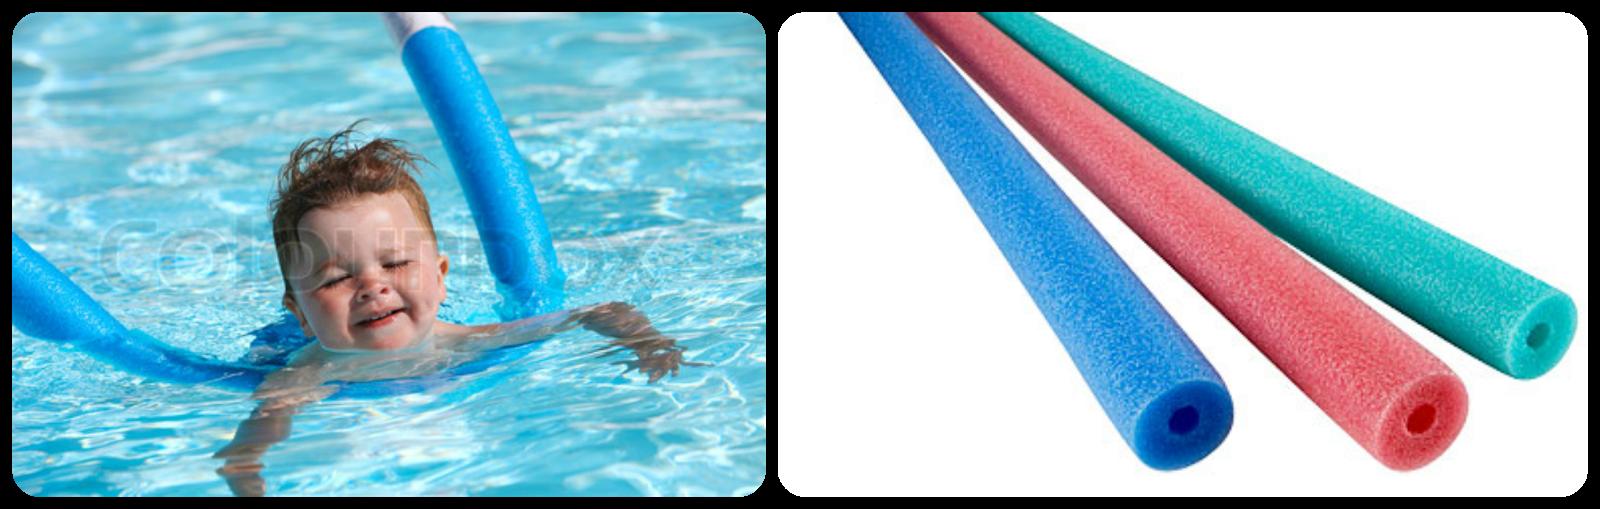 M s alla del rosa o azul for Clases de piscina para bebes